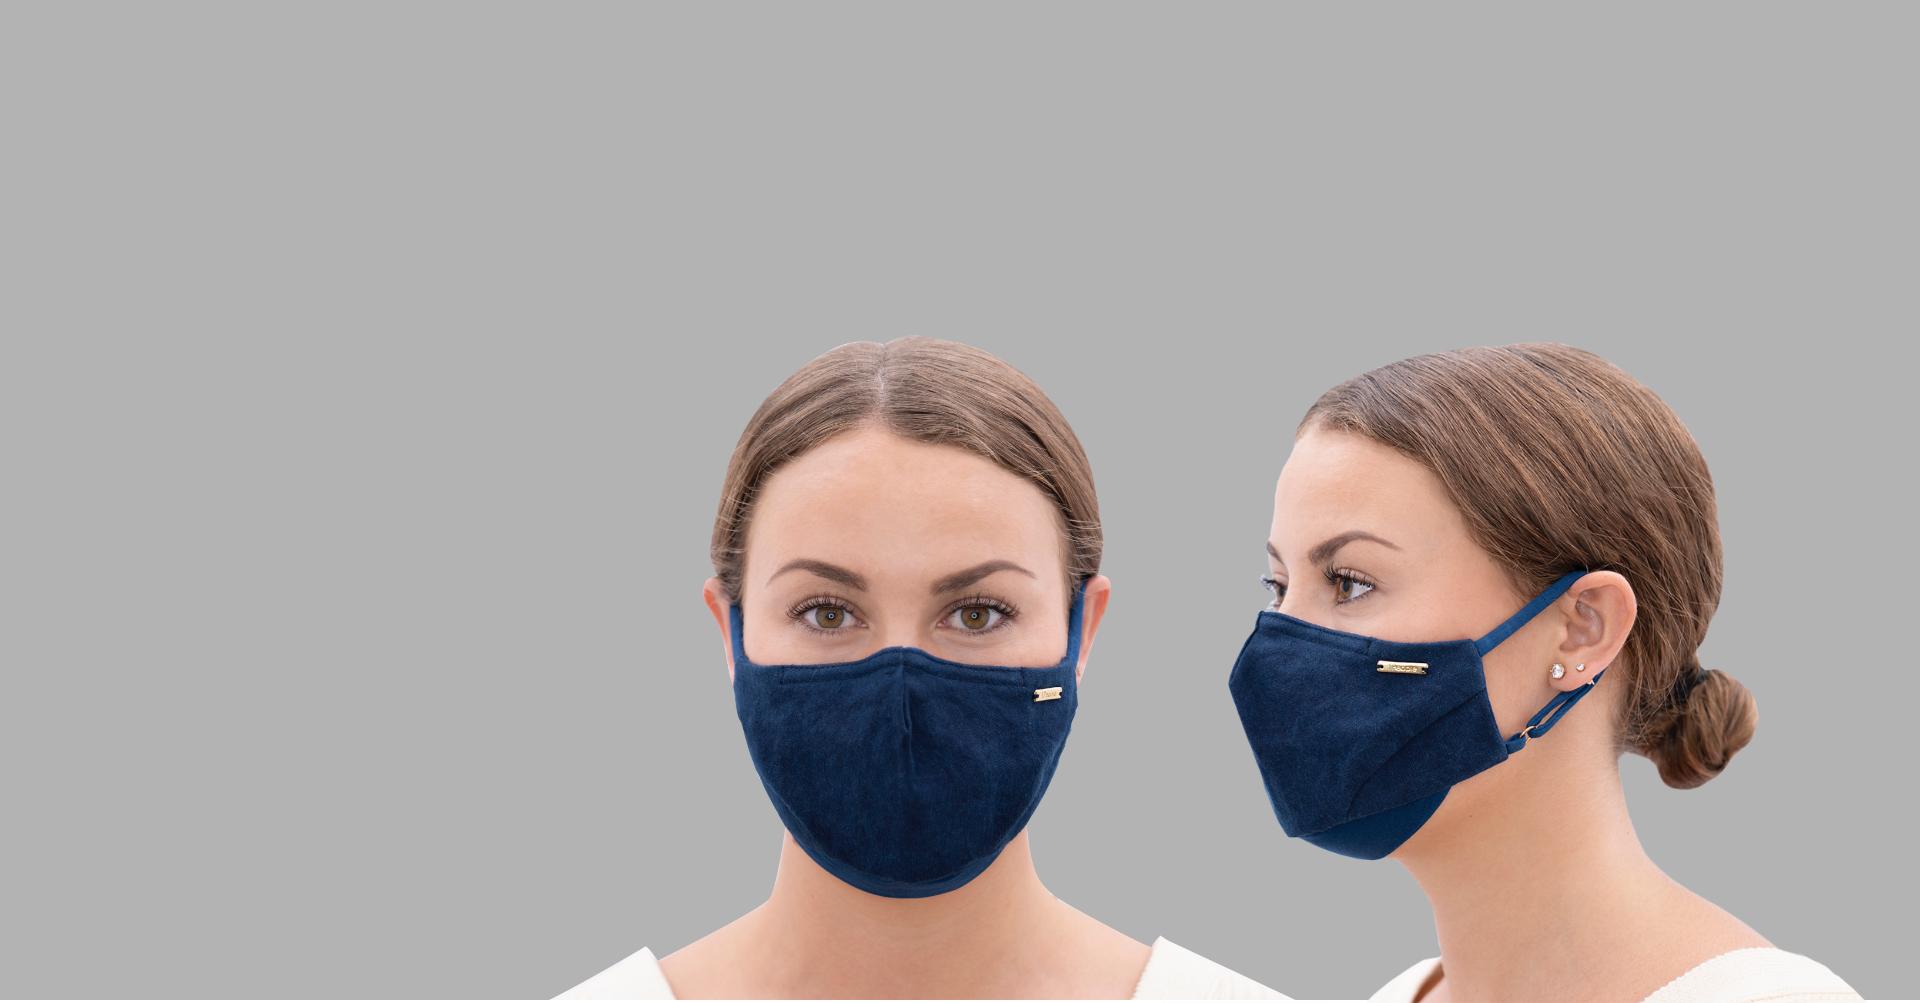 Stay Vigilant. Stay Elegant. Sustainable Luxury Stylish Face Mask by 1 People